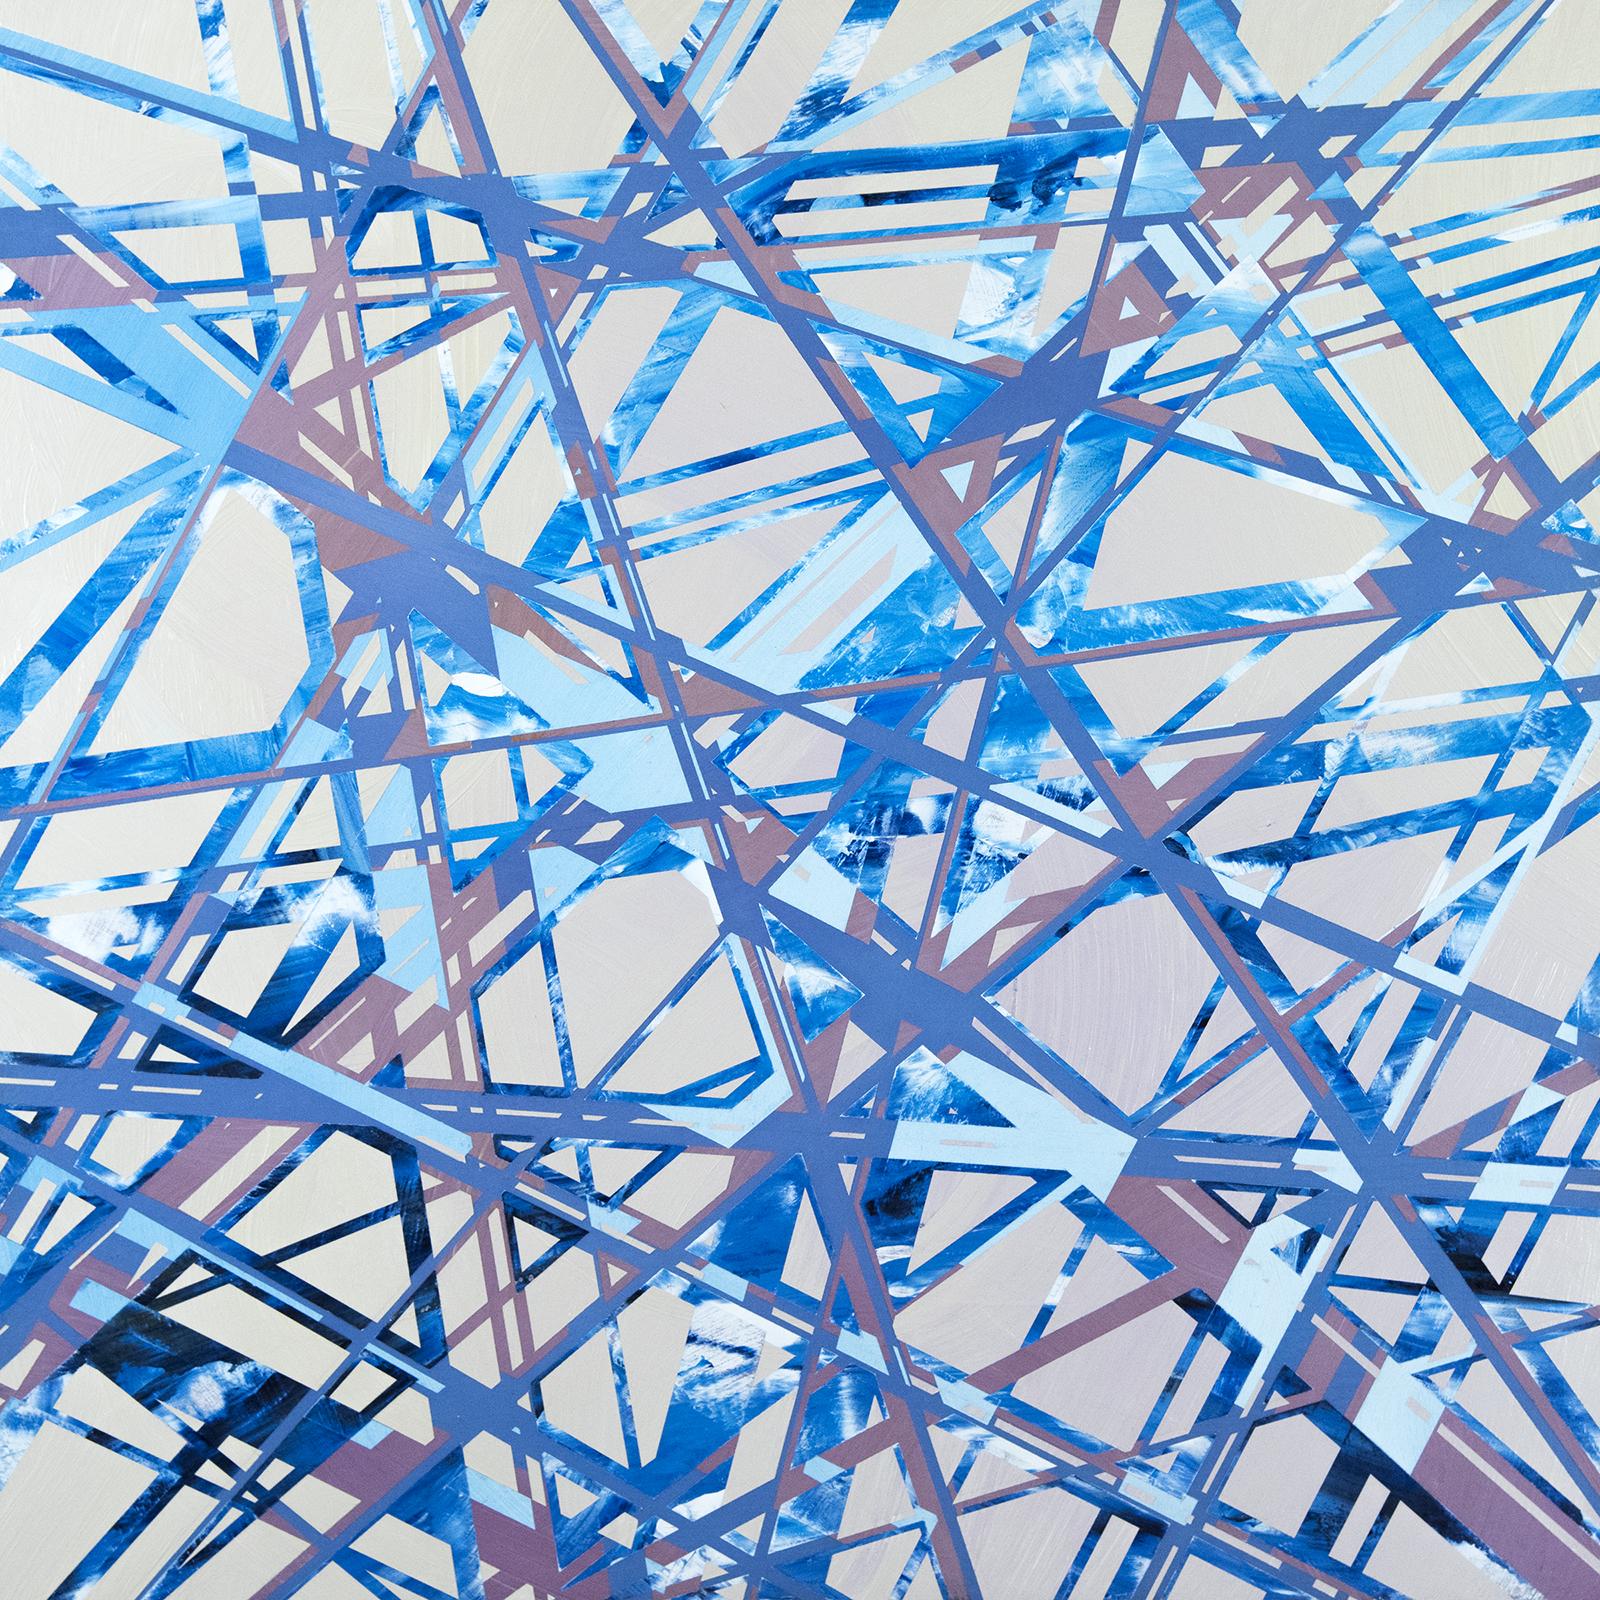 Daniel_Stuelpnagel-_Neural_Pattern_System_-30x30_-acryliconwoodpanel-2018-$900.jpg